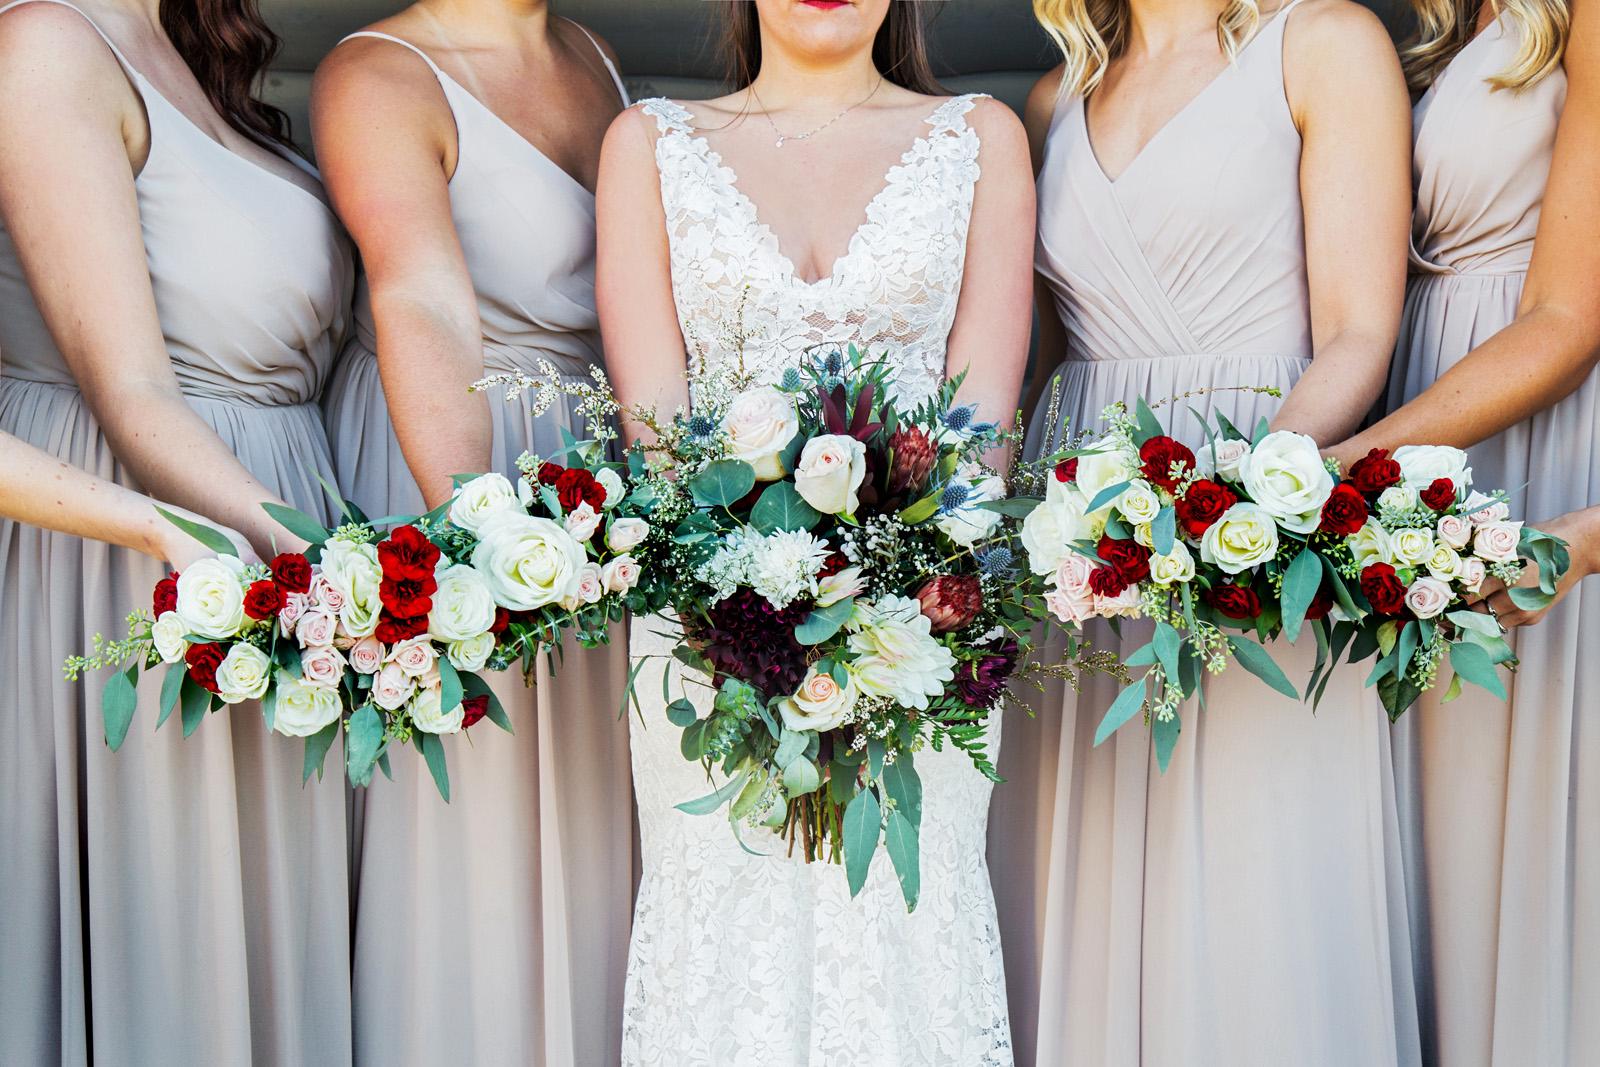 harris_wedding-2234.jpg